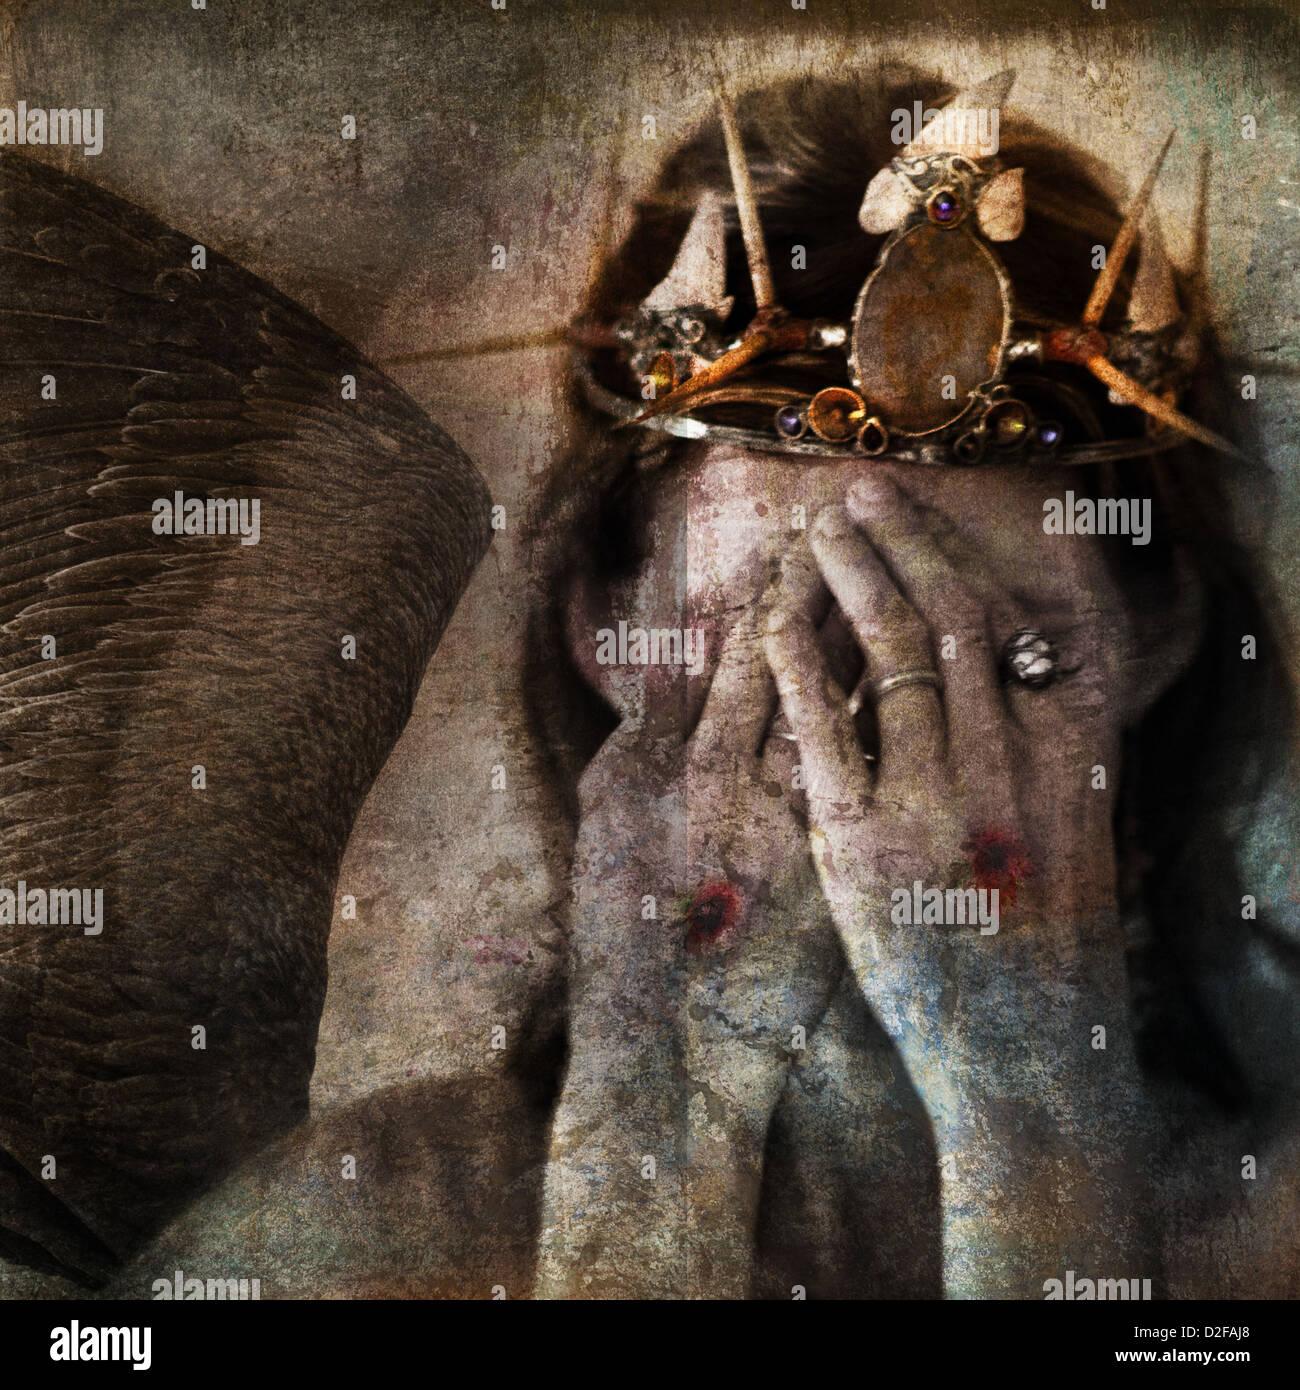 Shamanic angel martyr hiding face with stigmata on the hands. Photo base illustration. - Stock Image